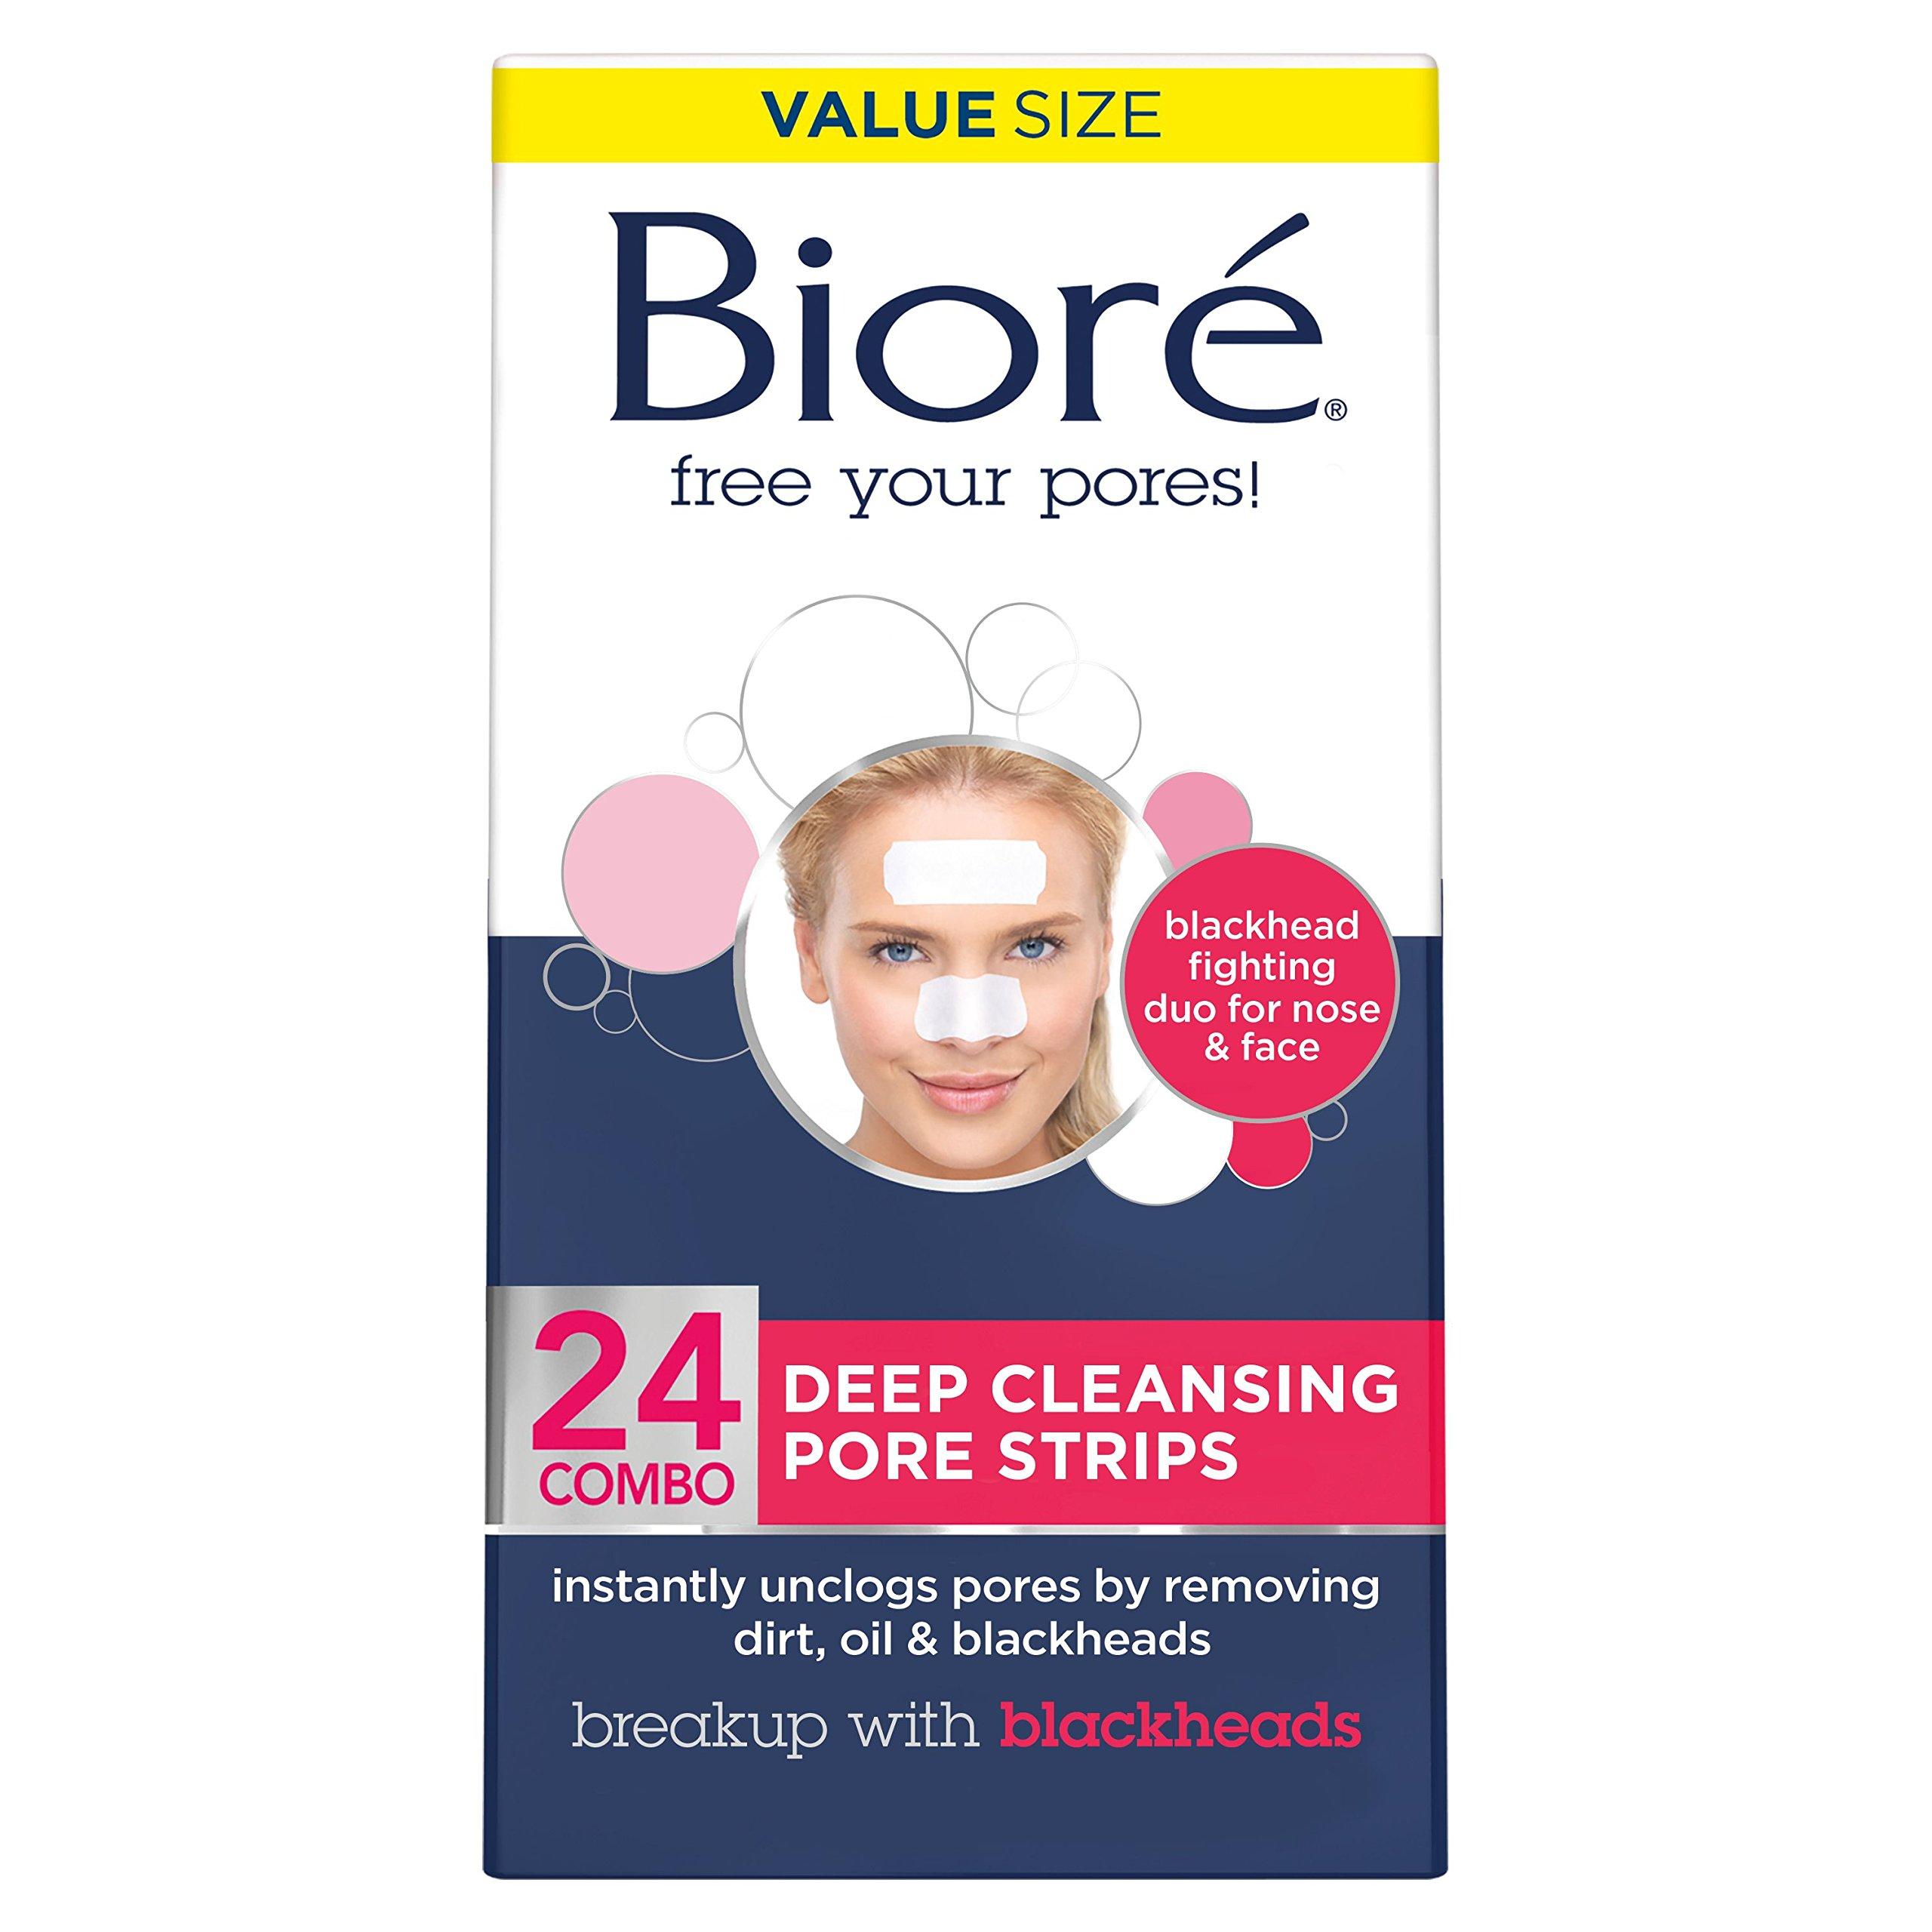 Biore Deep Cleansing Pore Strips, 24 Count by Bioré